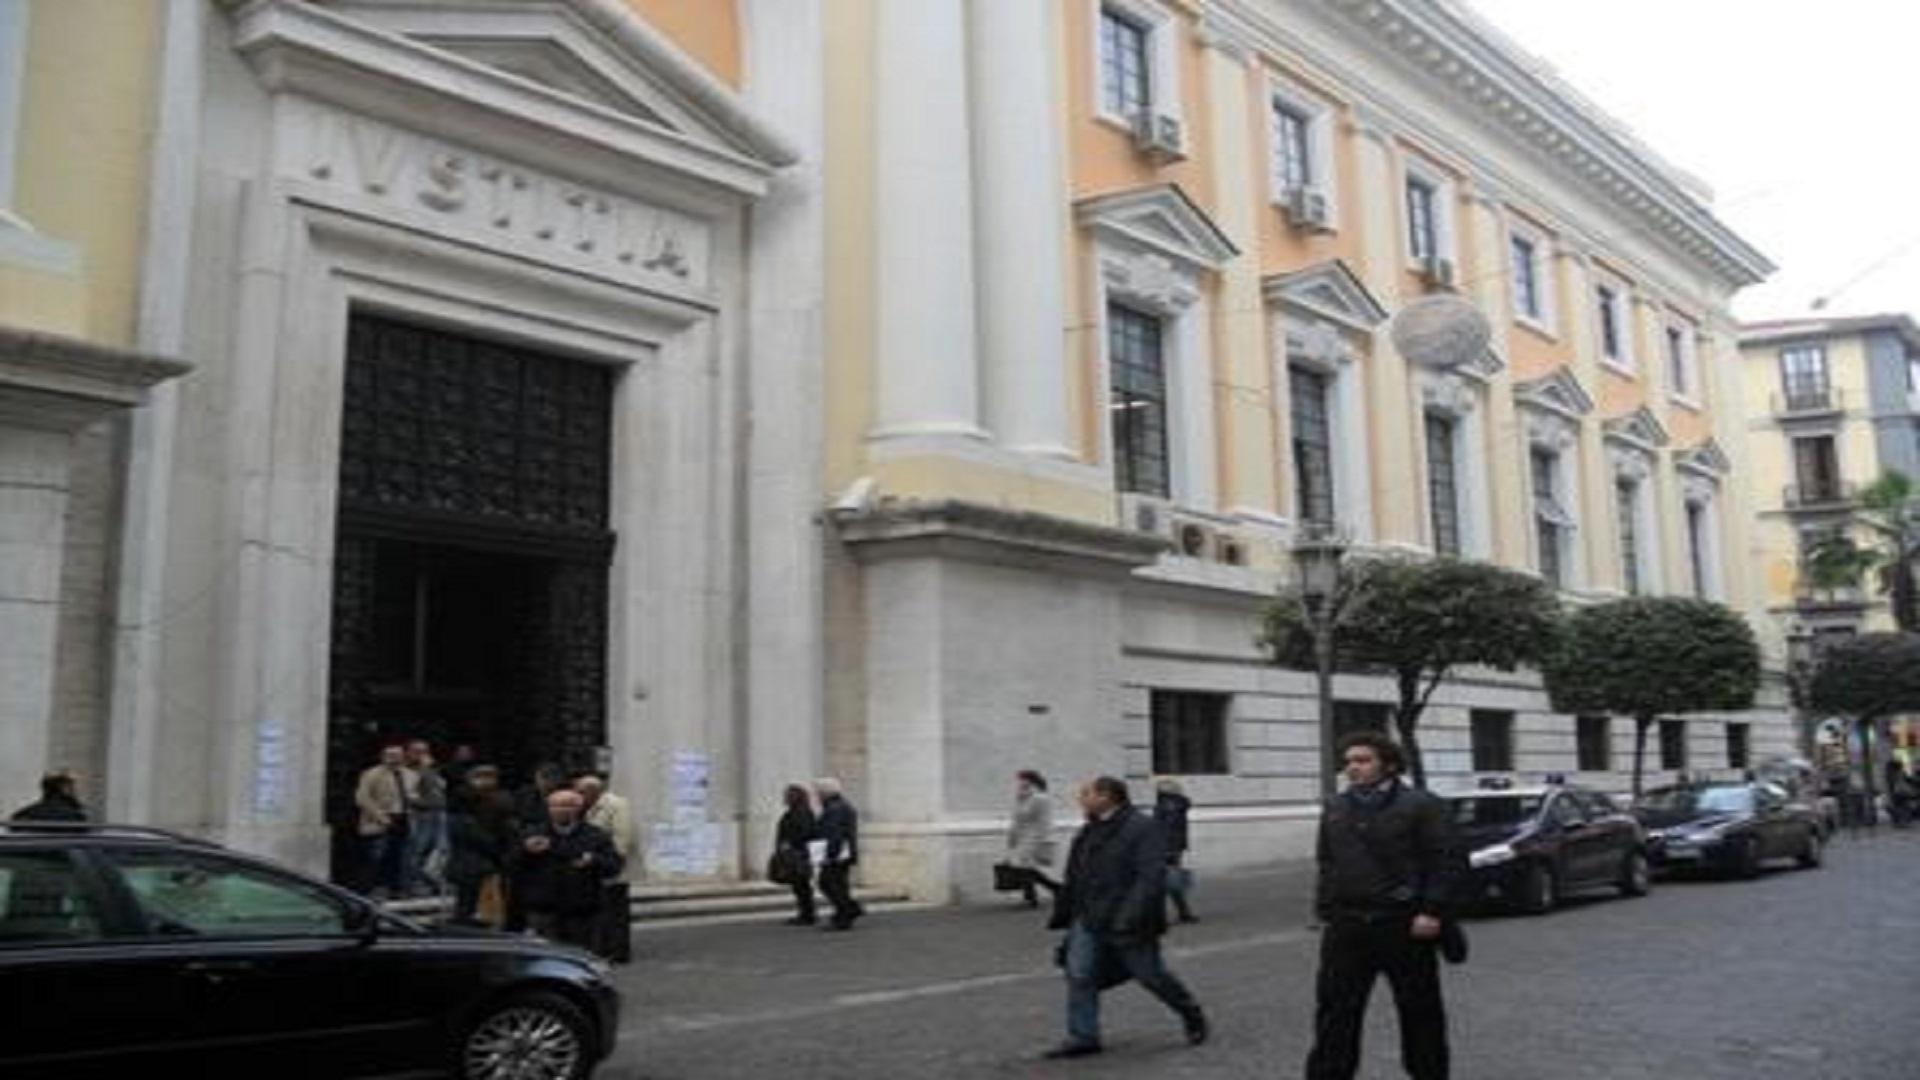 tribunale_di_salerno_672-458_resize